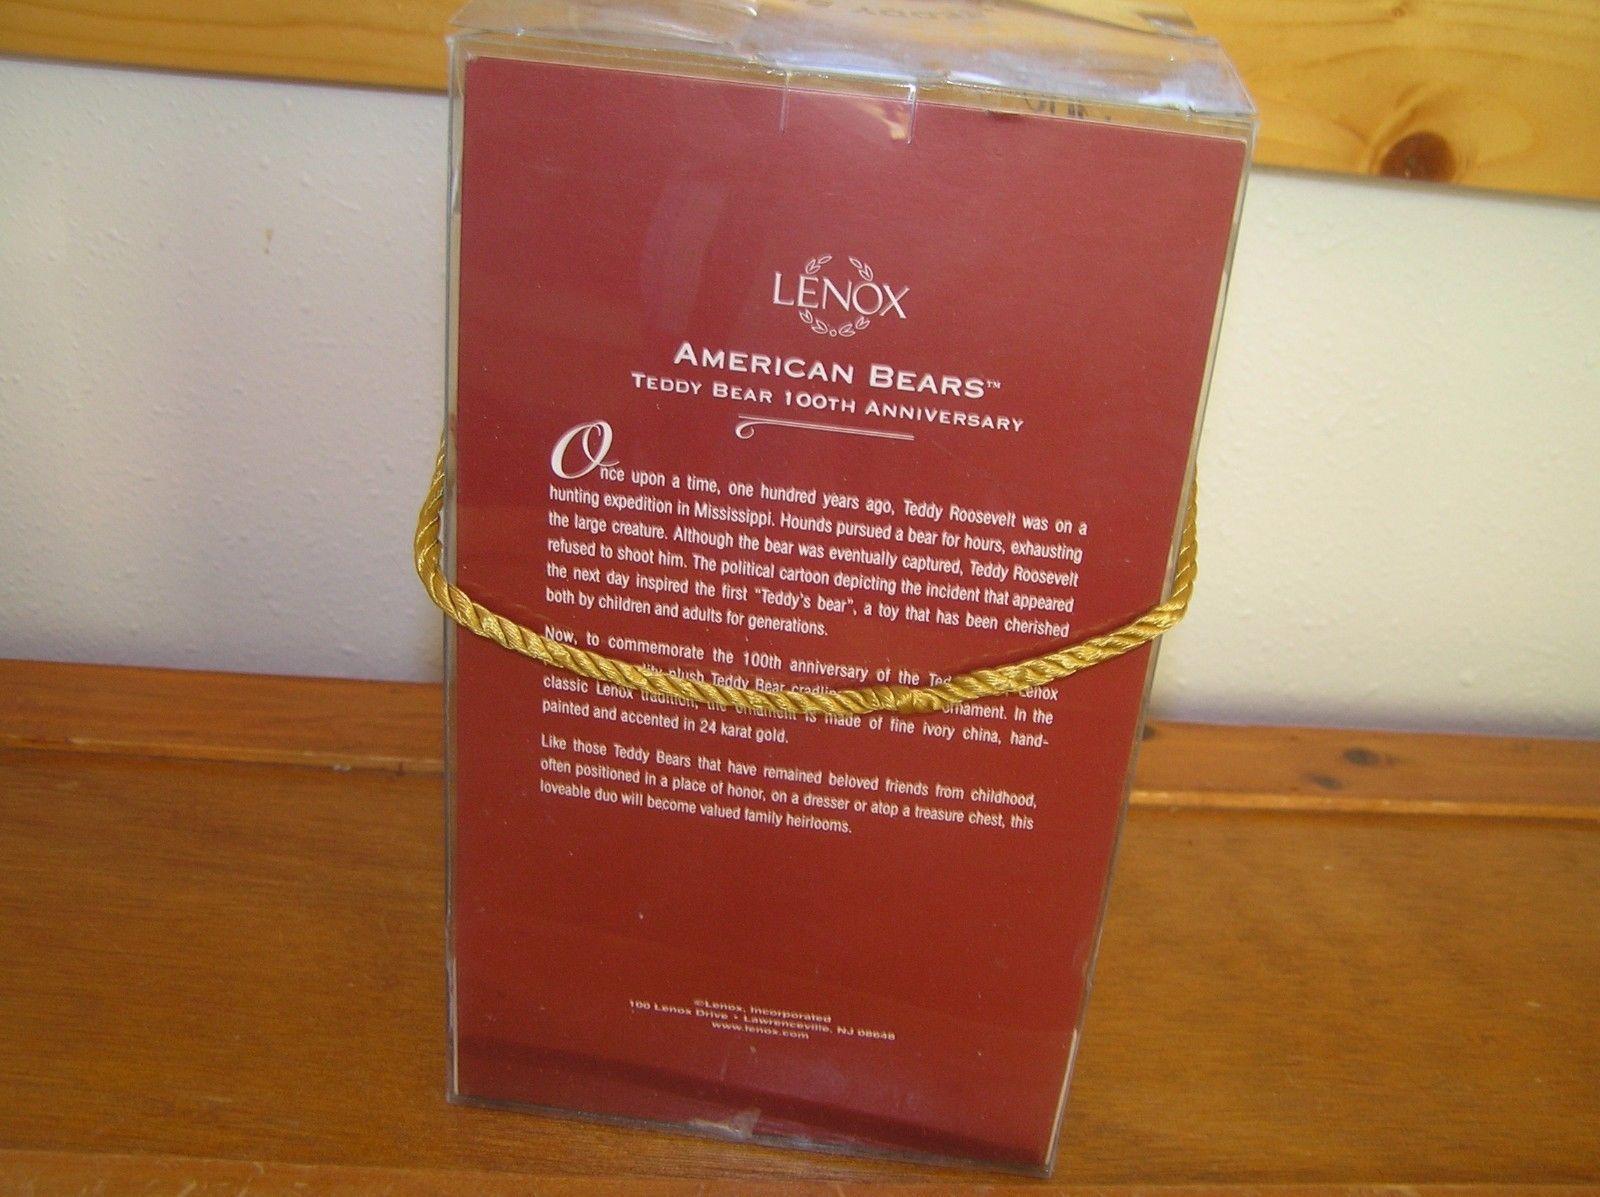 Lenox American Bears Teddy Bear 100th Anniversary Small Plush & China Tree Ornam